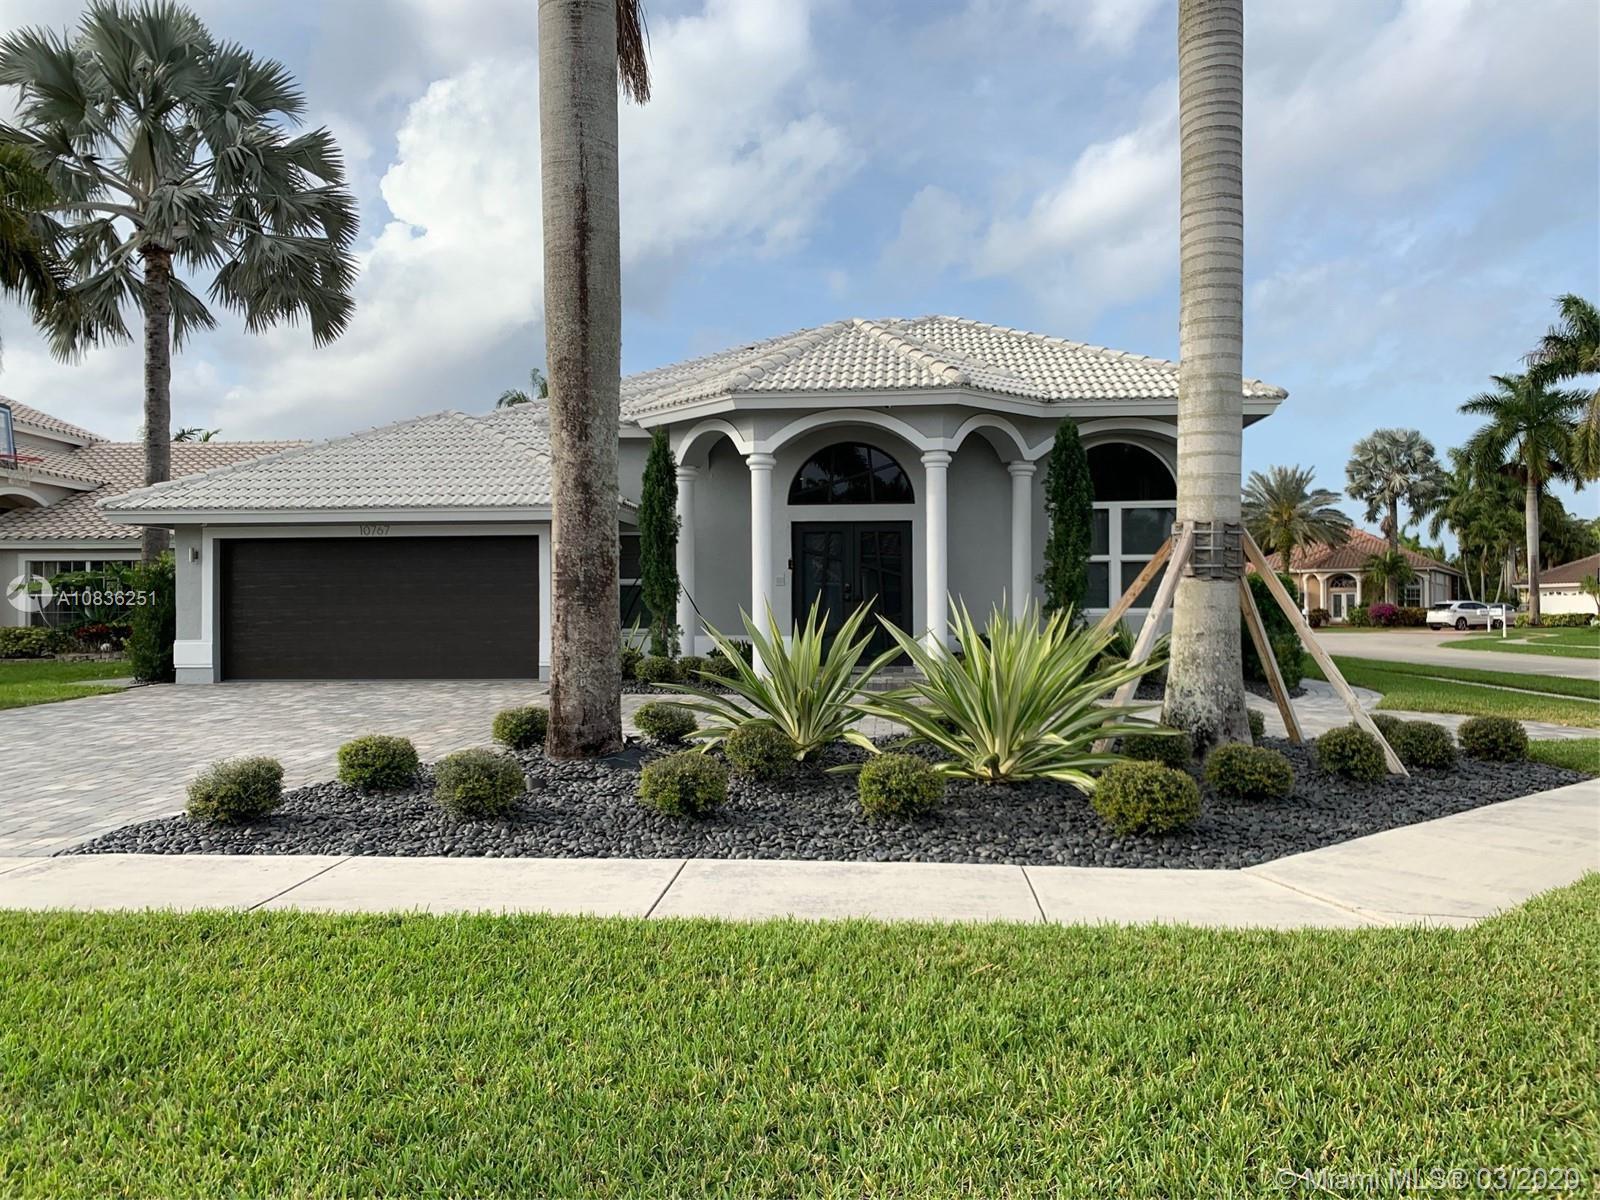 10767 Queen Palm Ct, Boca Raton, FL 33498